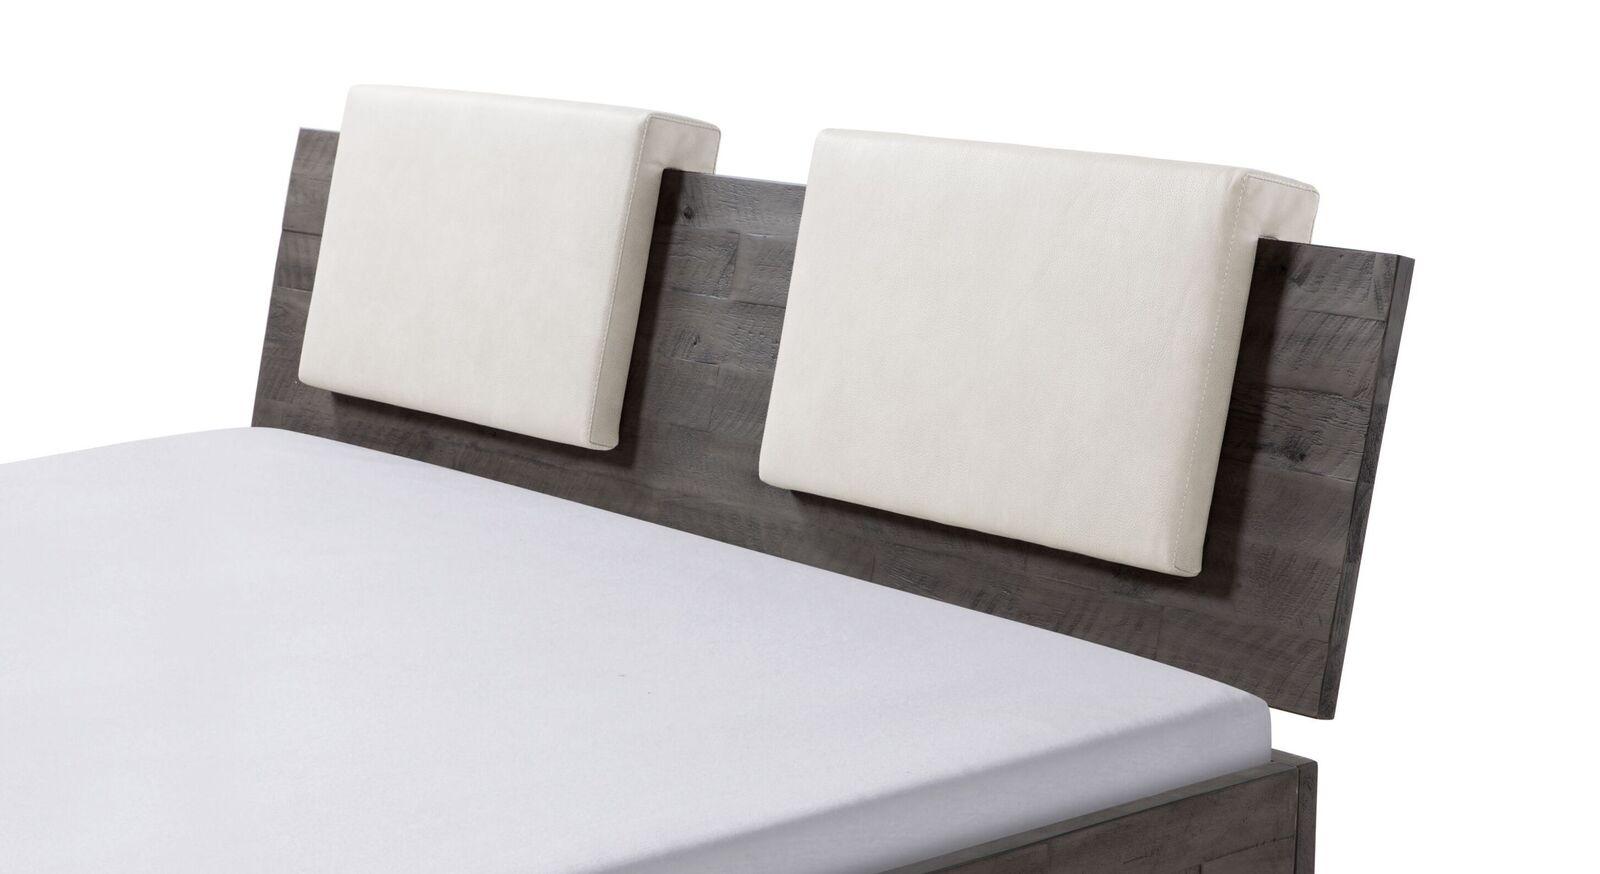 Einsteck-Kissen Rimini mit Luxus-Kunstlederbezug in Weiß